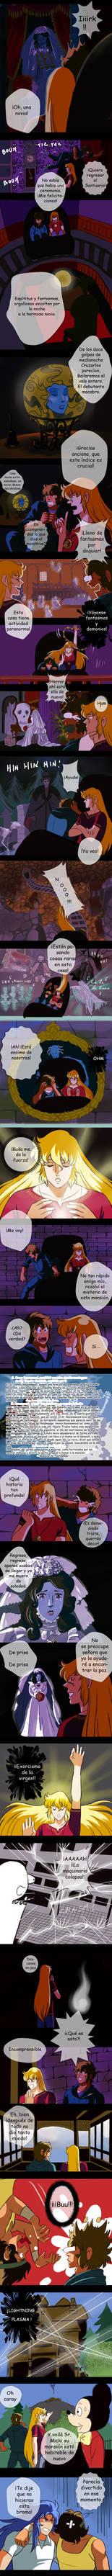 saintseiya parodie 12 part 3 (SPANISH) by kori